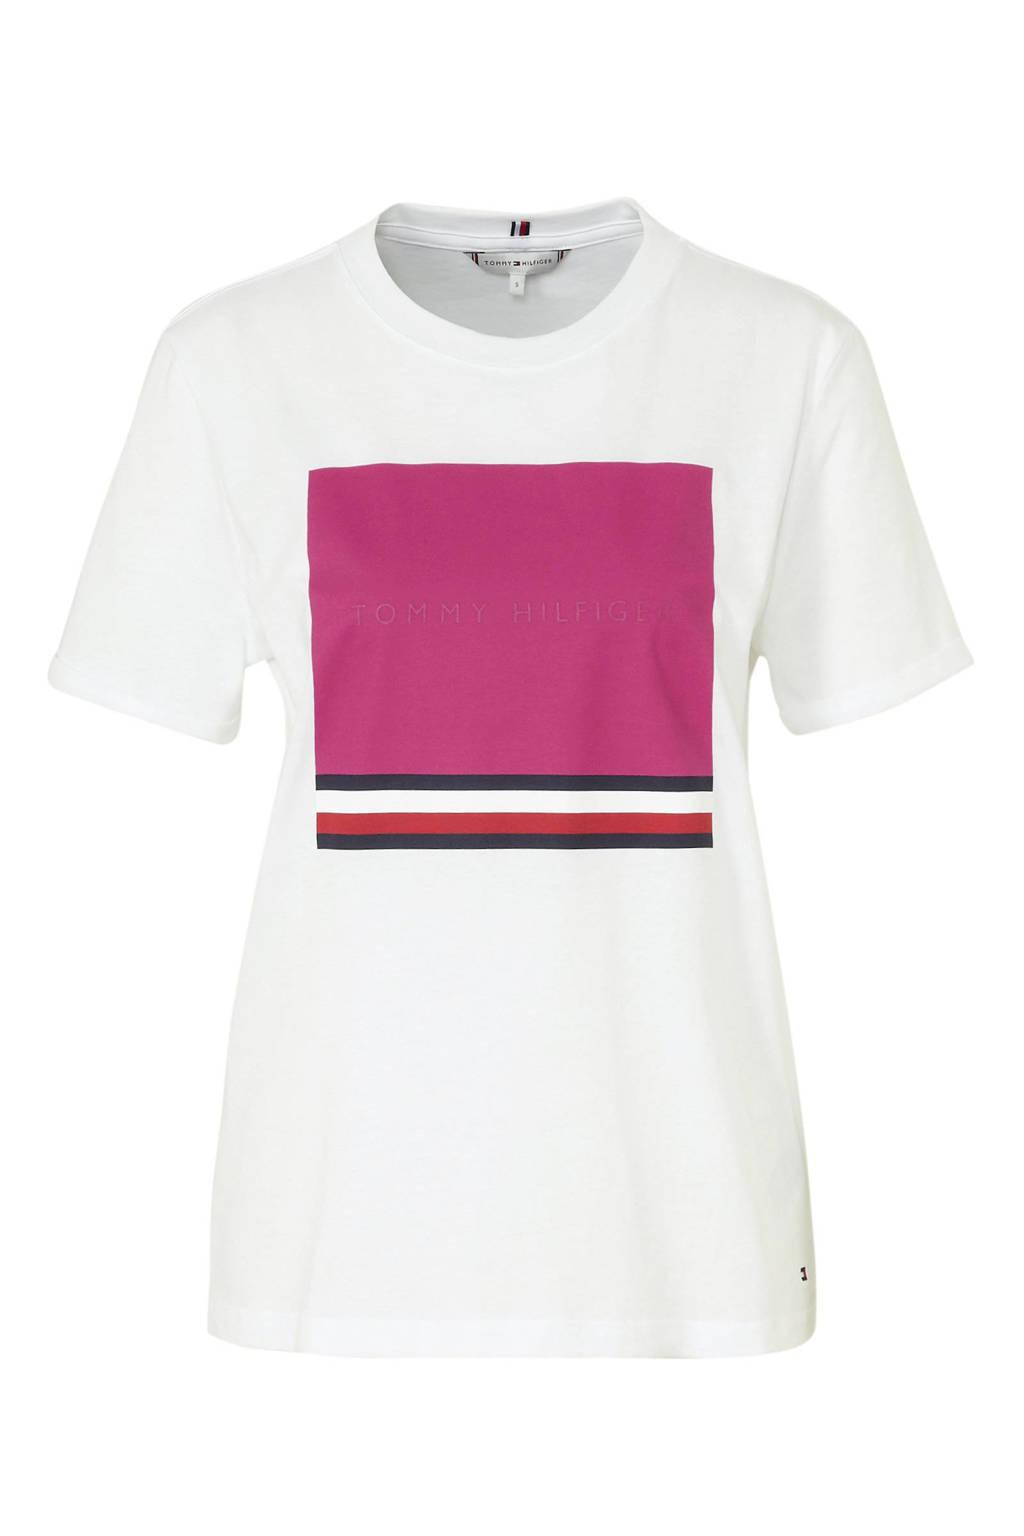 Tommy Hilfiger T-shirt met logo wit/roze, Wit/roze